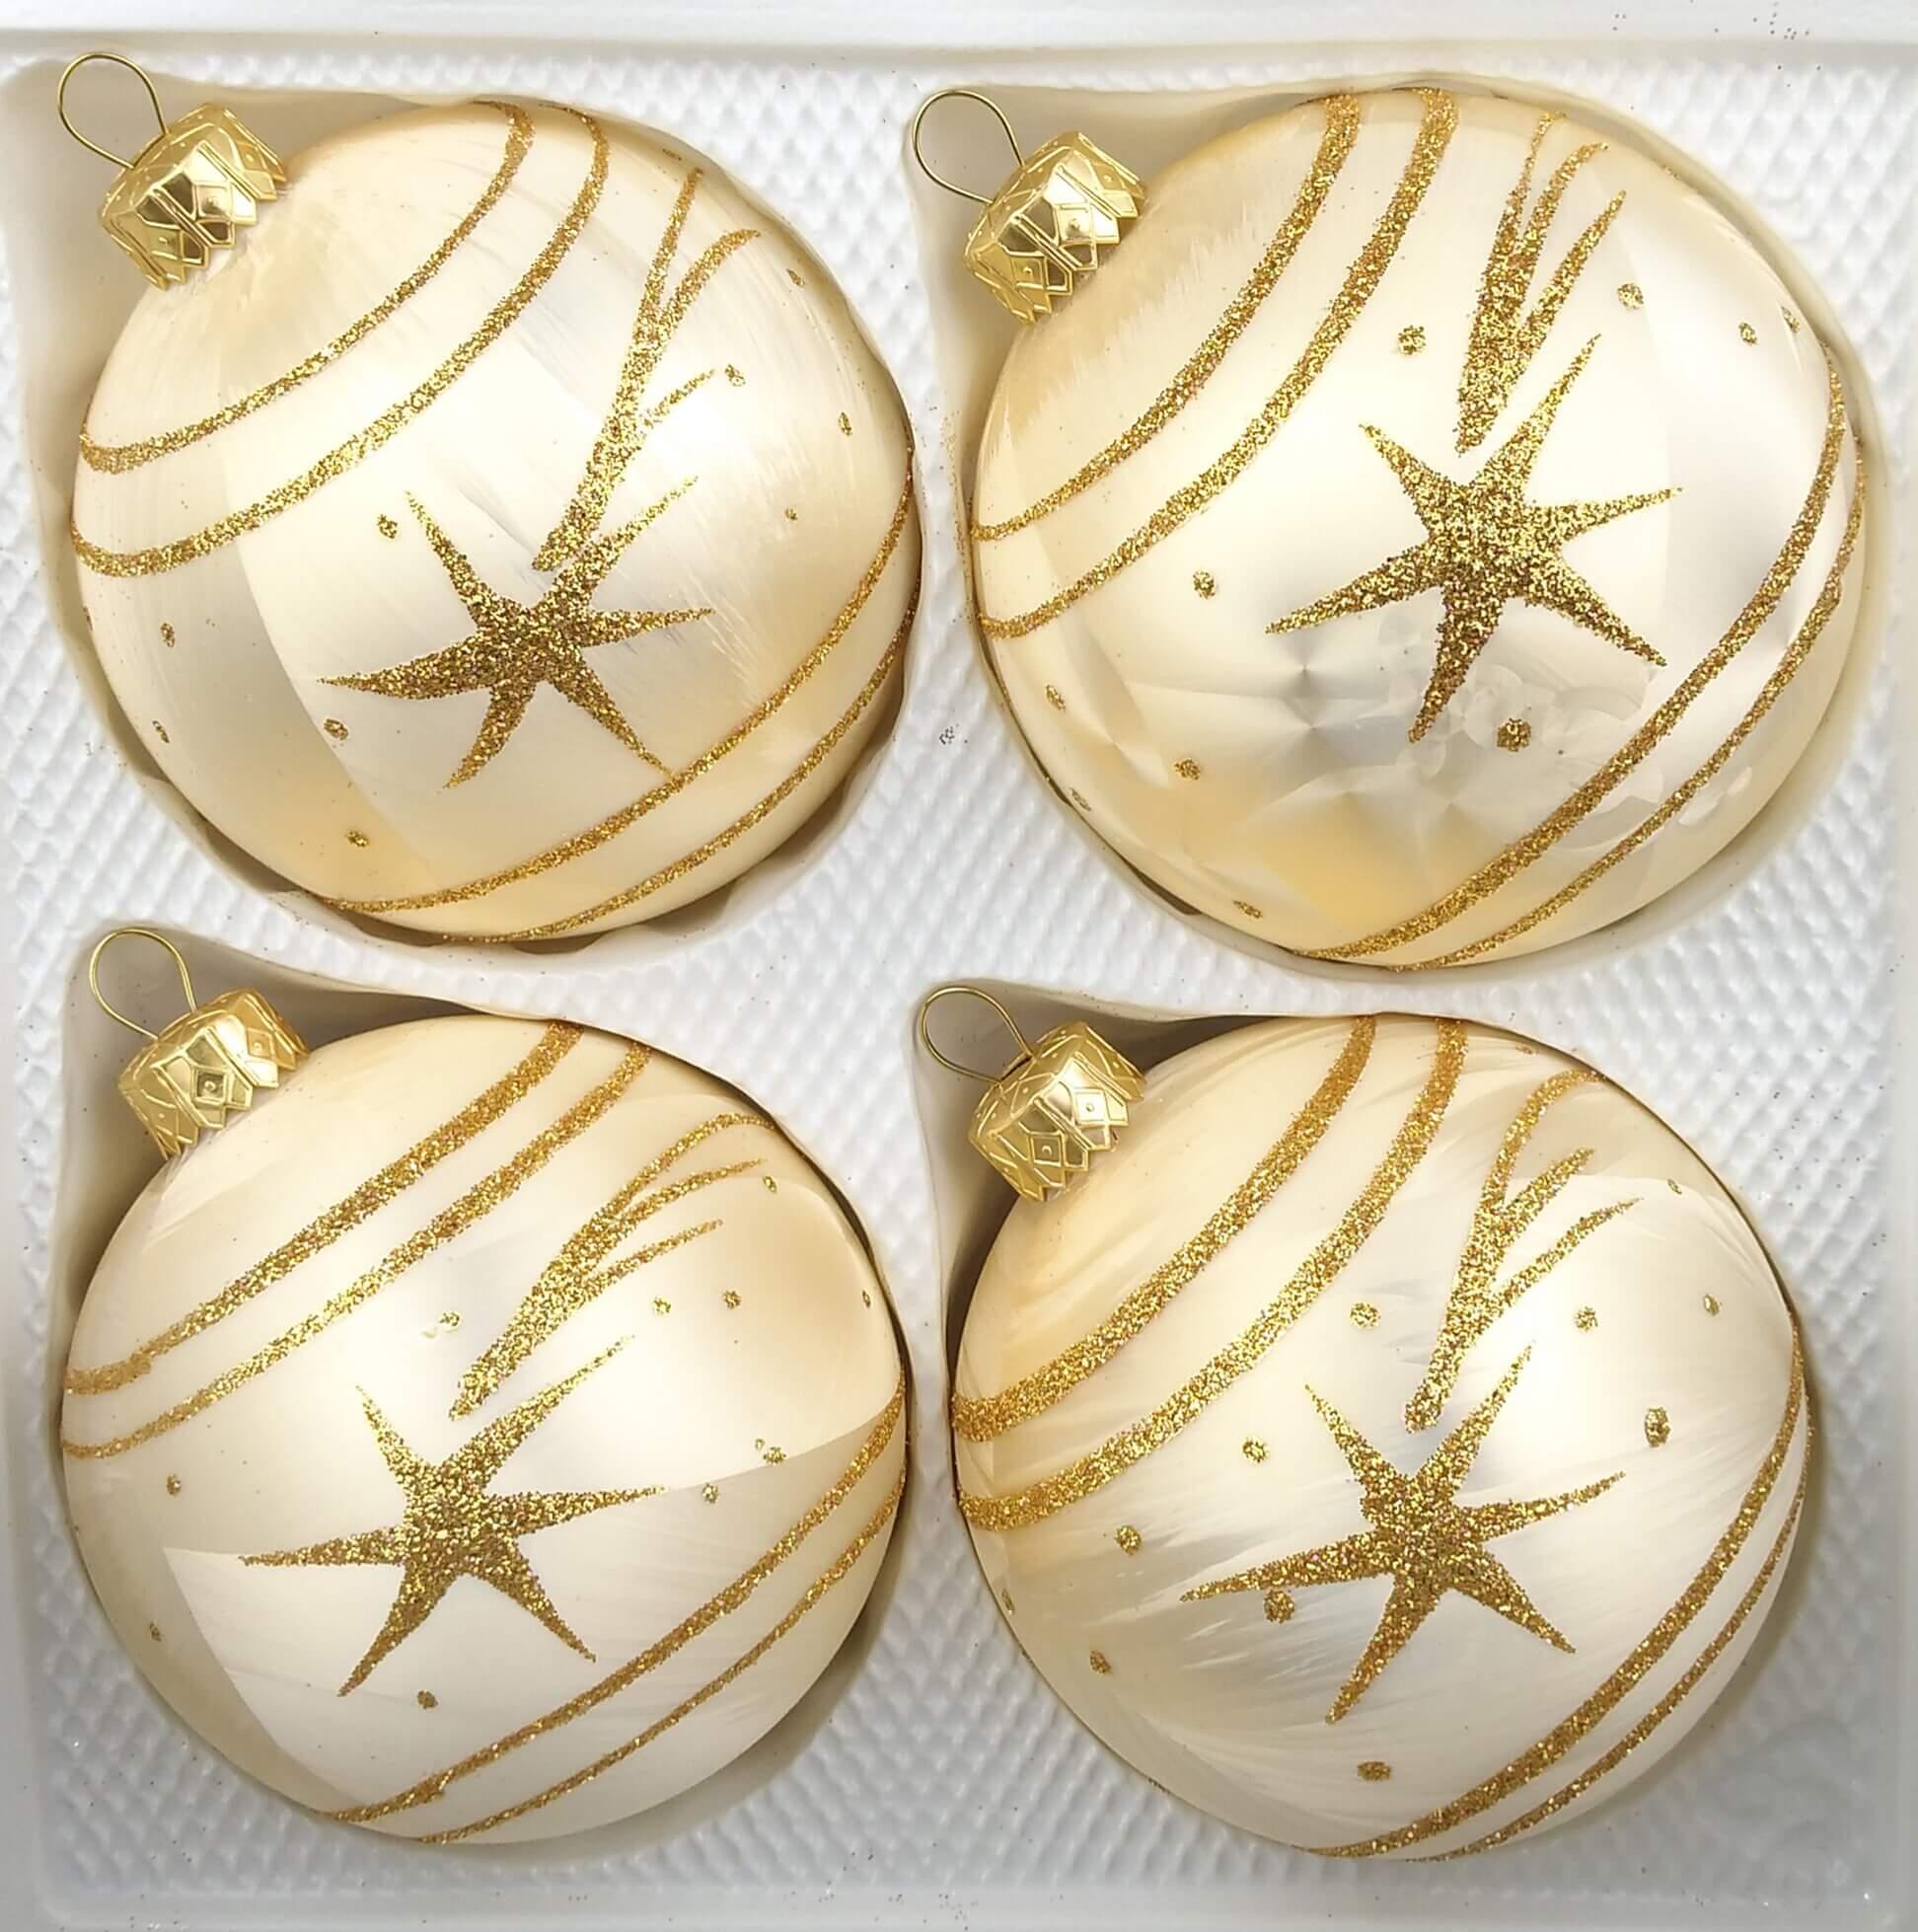 Christbaumkugeln 12 Cm Durchmesser.4 Tlg 12cm Glas Weihnachtskugeln Set 12cm O In Ice Champagner Gold Komet